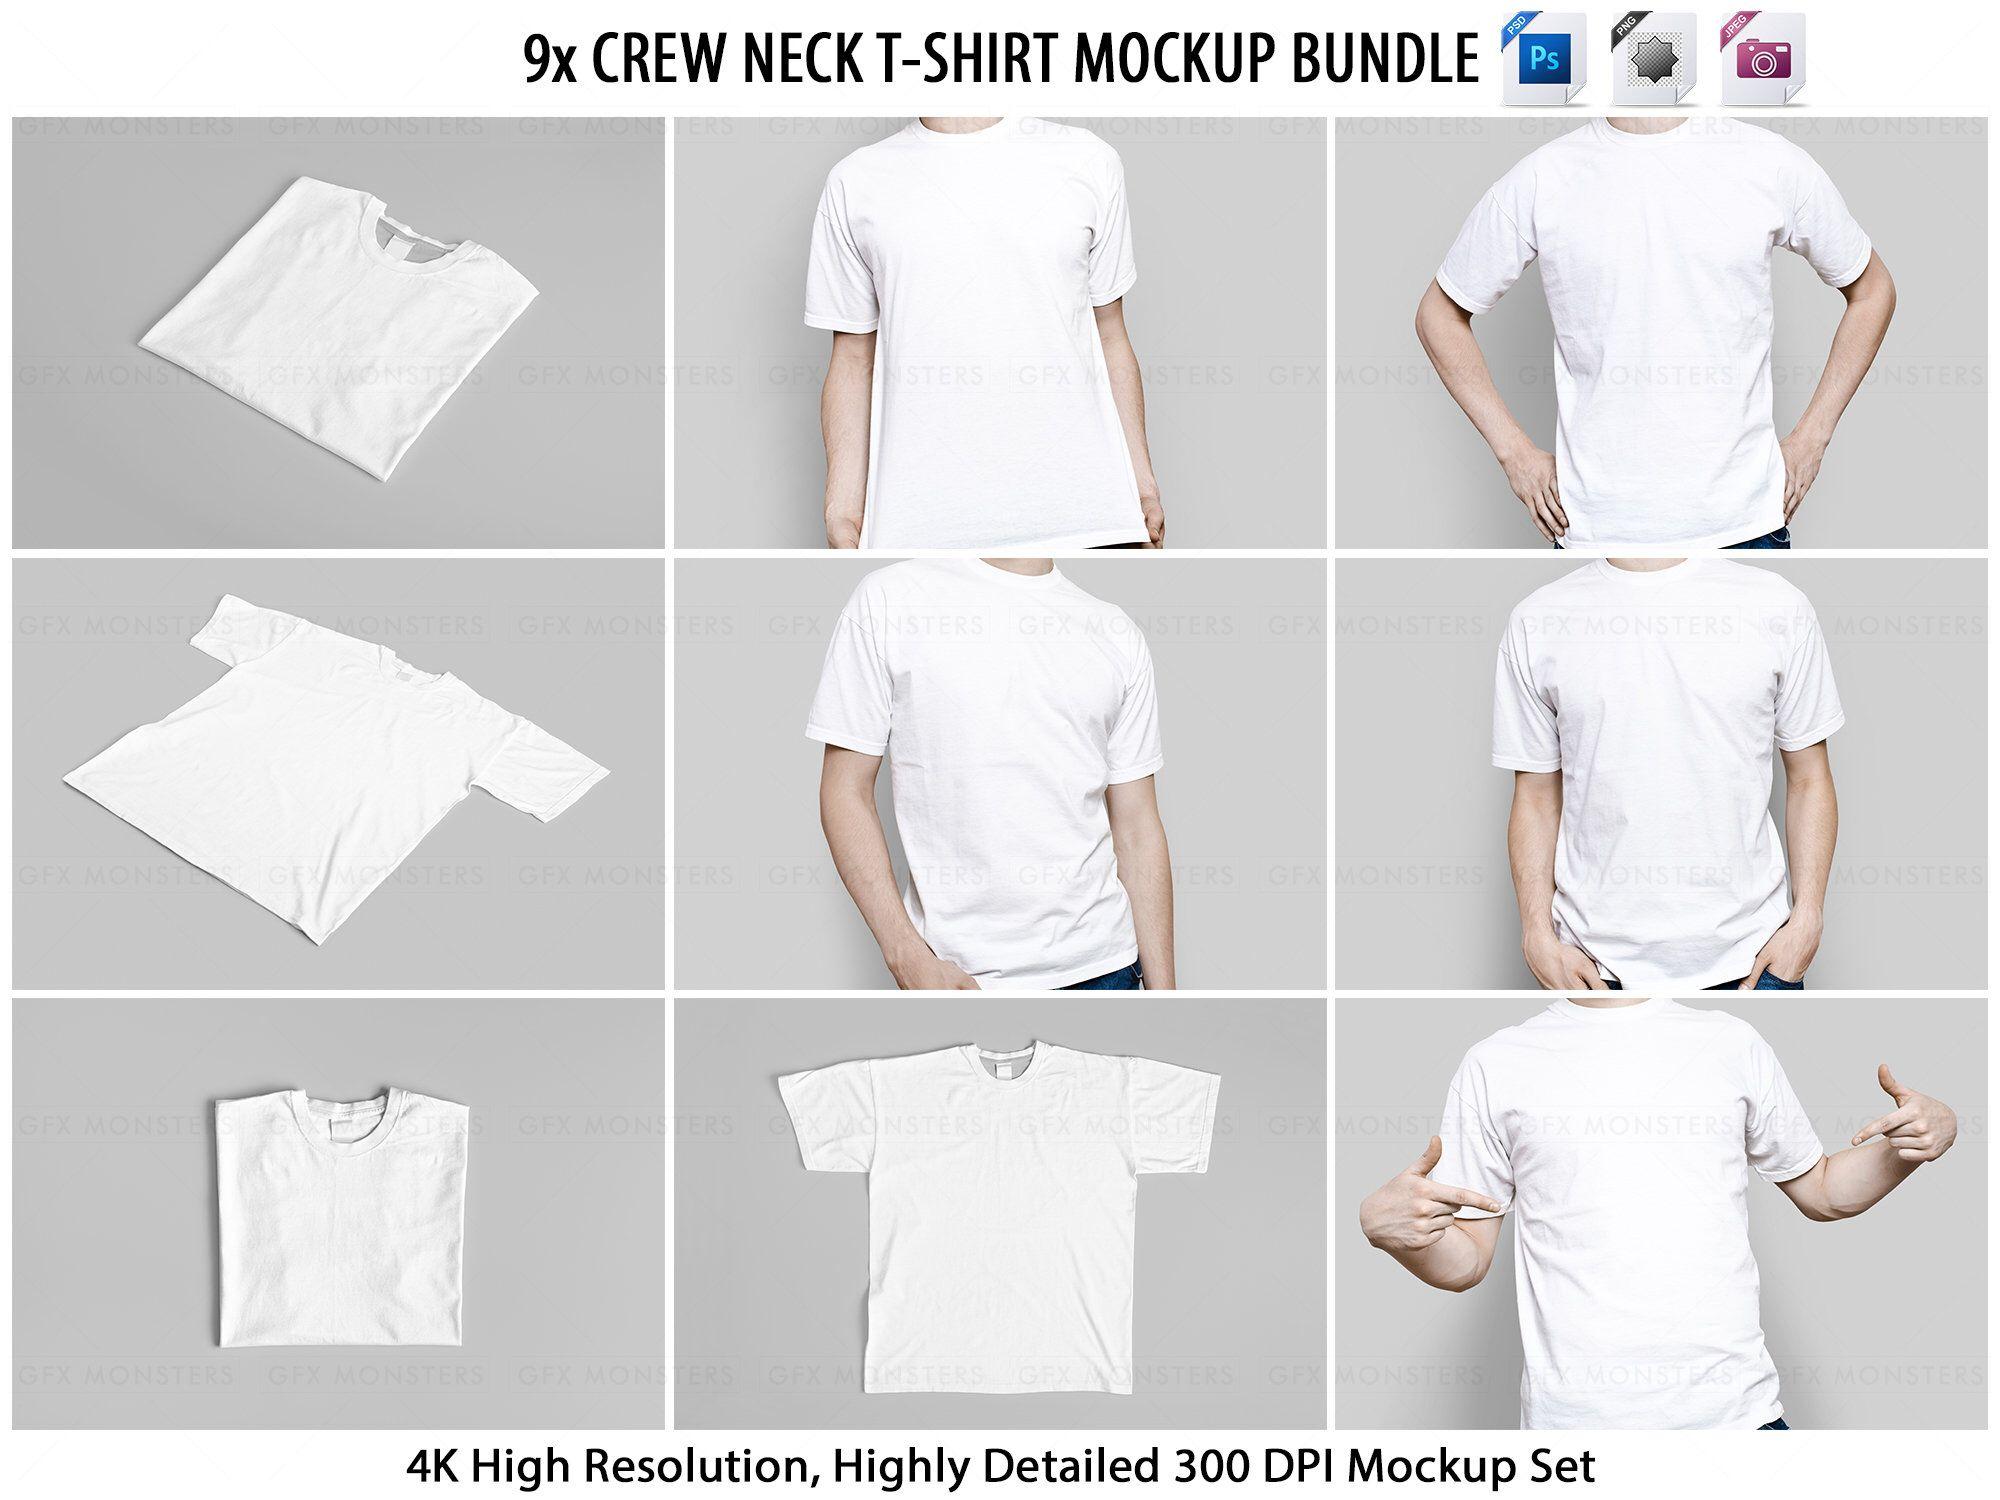 Download T Shirt Mockup Psd Crew Neck 9 Jpeg 9 Png 9 Psd Etsy Clothing Mockup Crew Neck Tshirt Tshirt Mockup